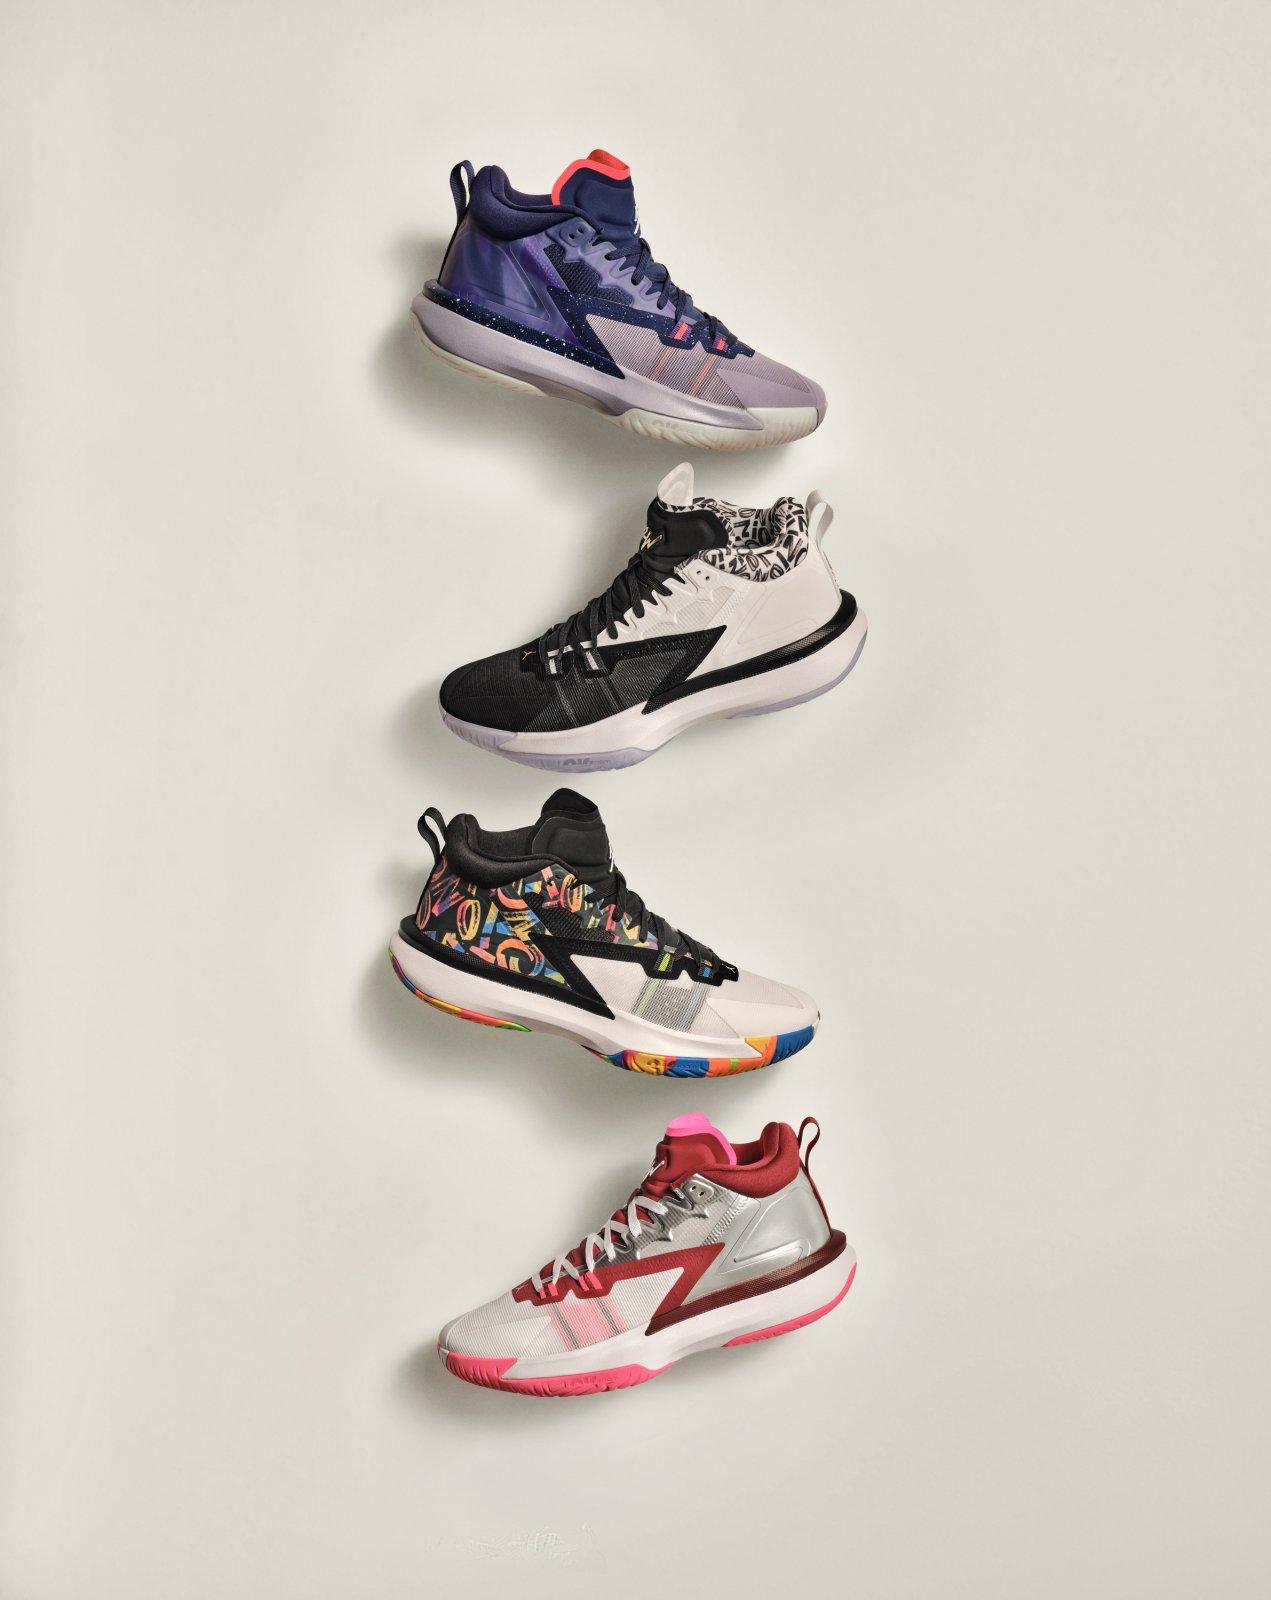 NikeNews_JordanBrand_ZionWilliamson_Zion1_08_102103.jpg